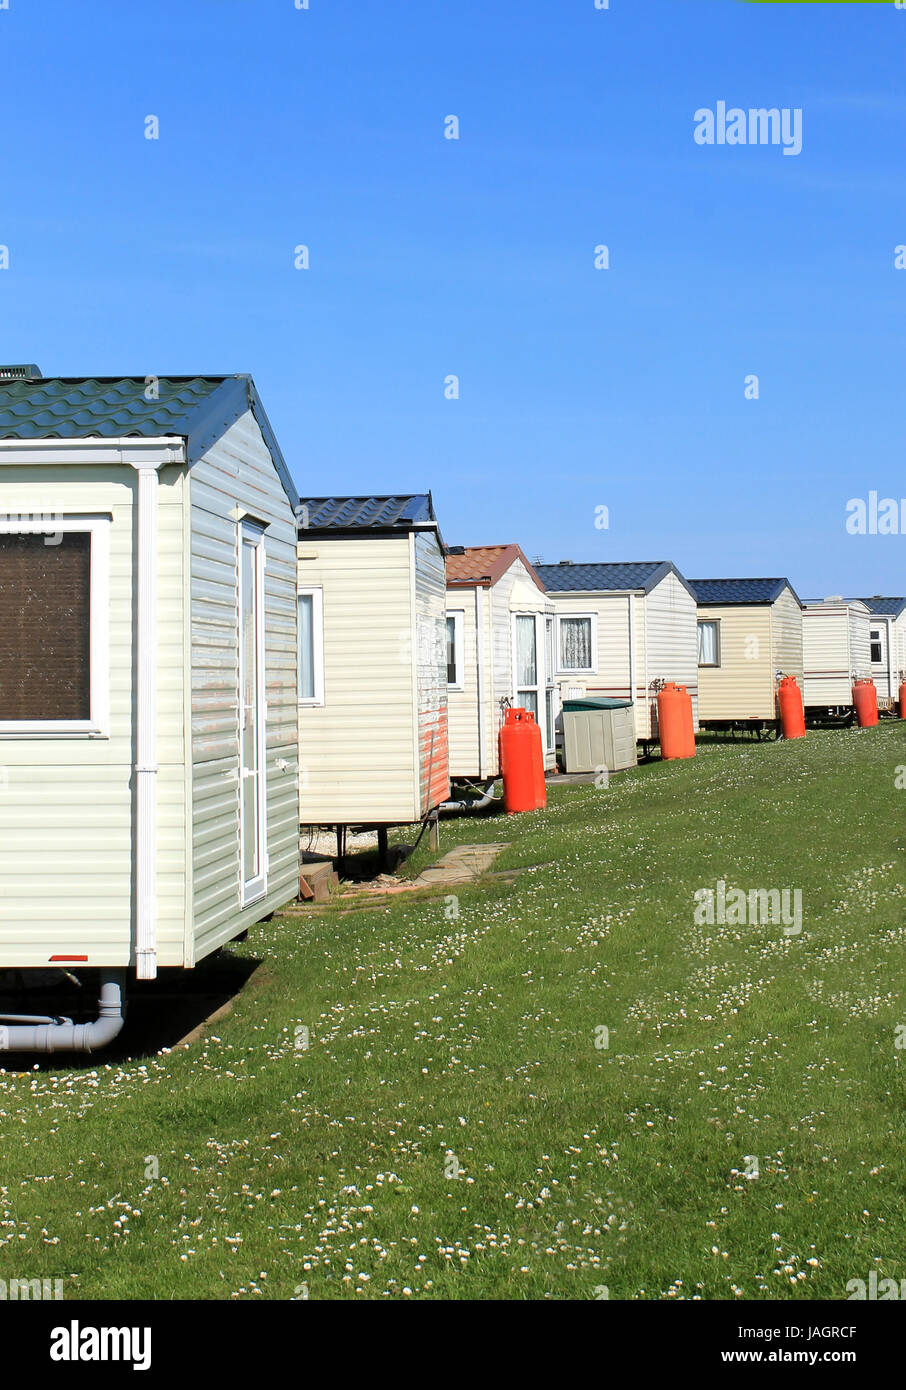 Blue Skies Mobile Home Park : skies, mobile, Scenic, Caravans, Trailer, Stock, Photo, Alamy